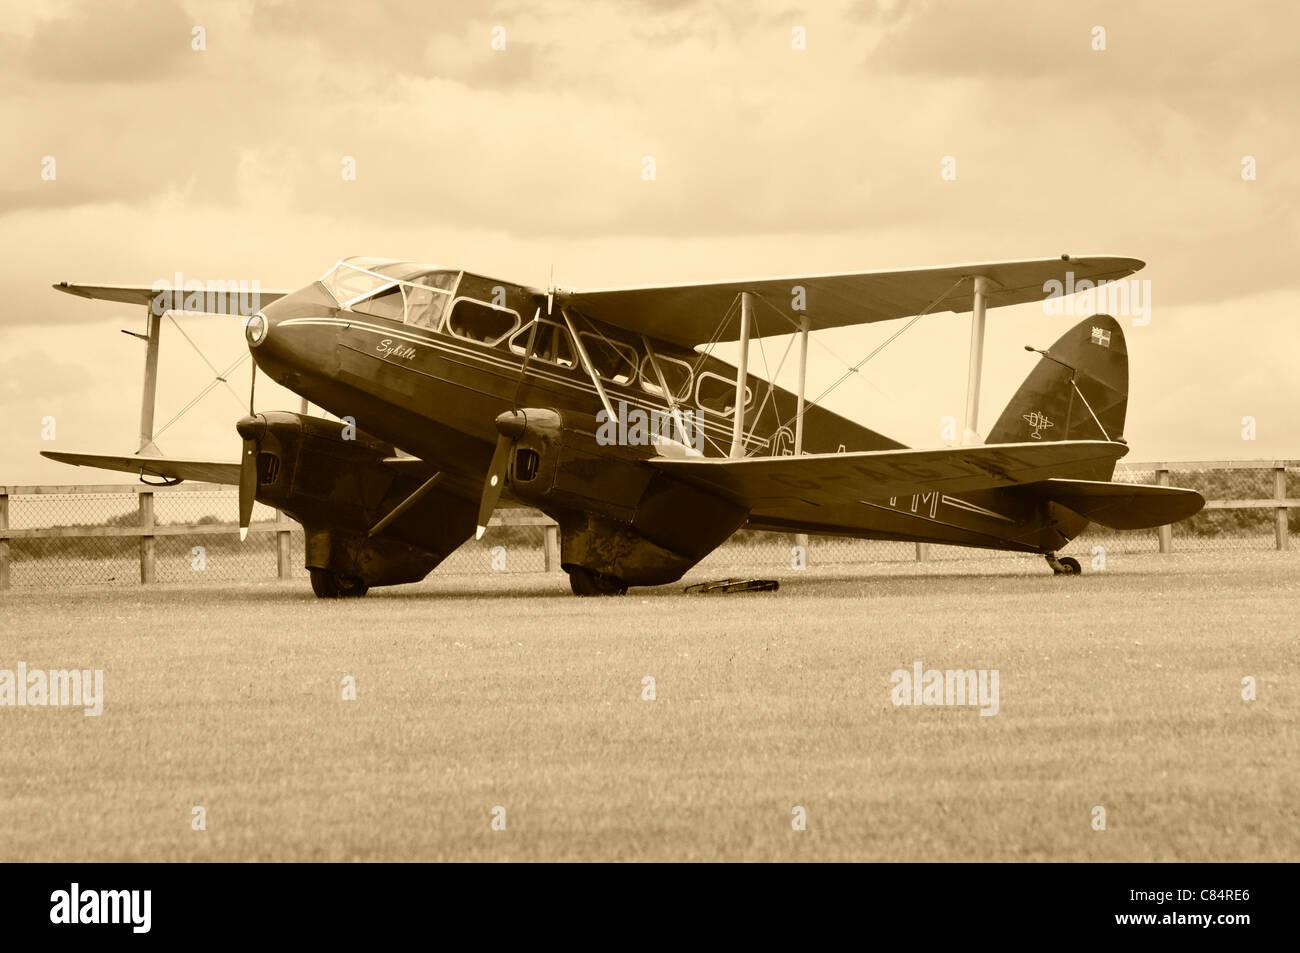 De Havilland DH.89A Dragon Rapide 6 - Stock Image